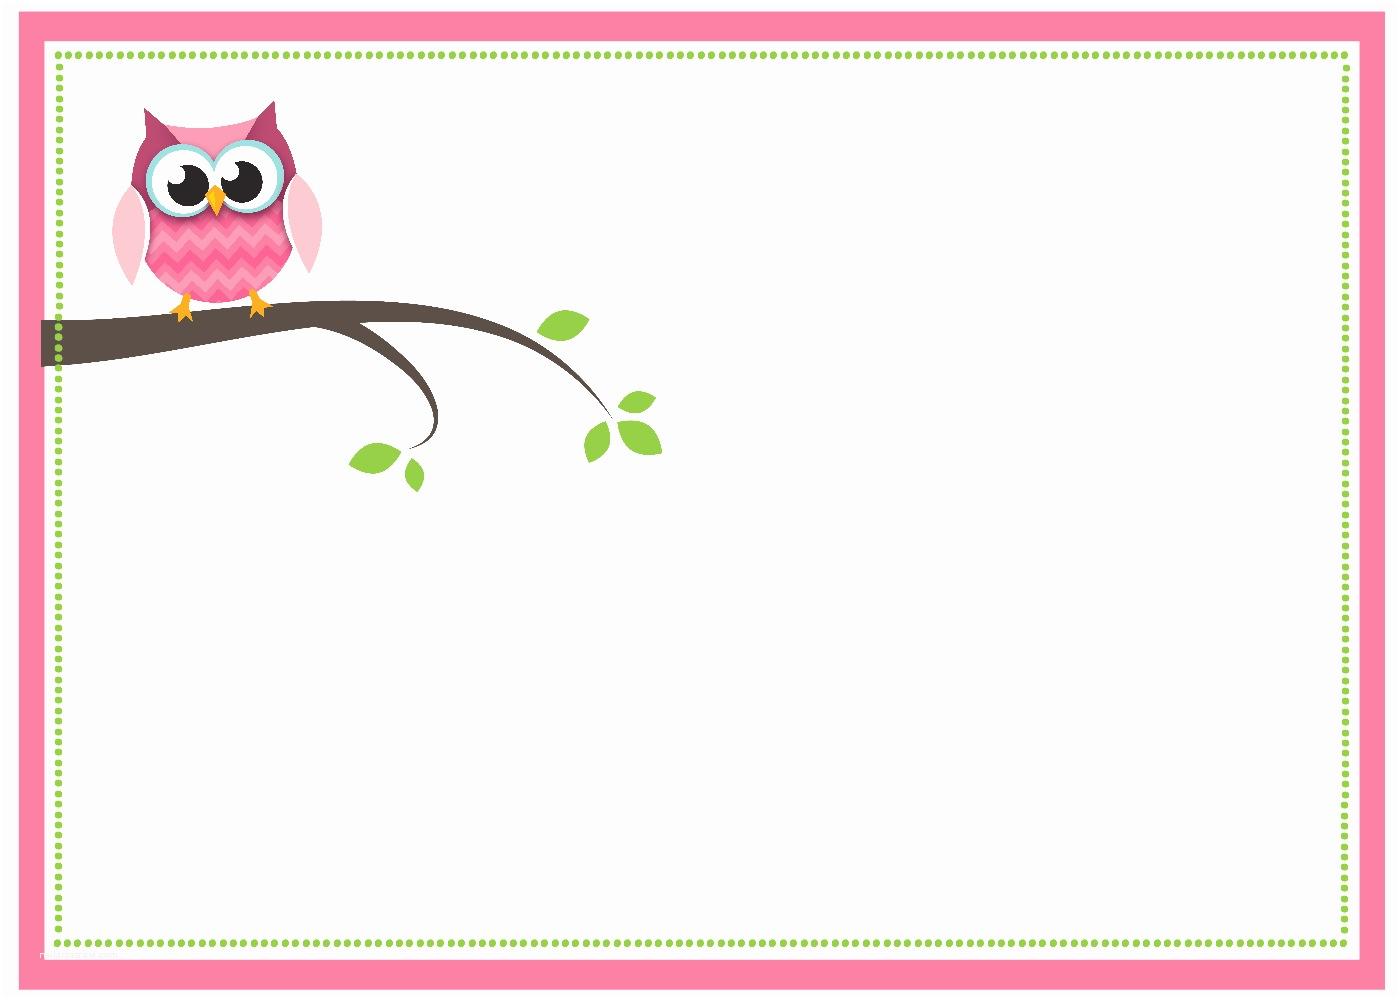 Free Printable Owl Baby Shower Invitations Free Printable Owl Baby Shower Invitations & Other